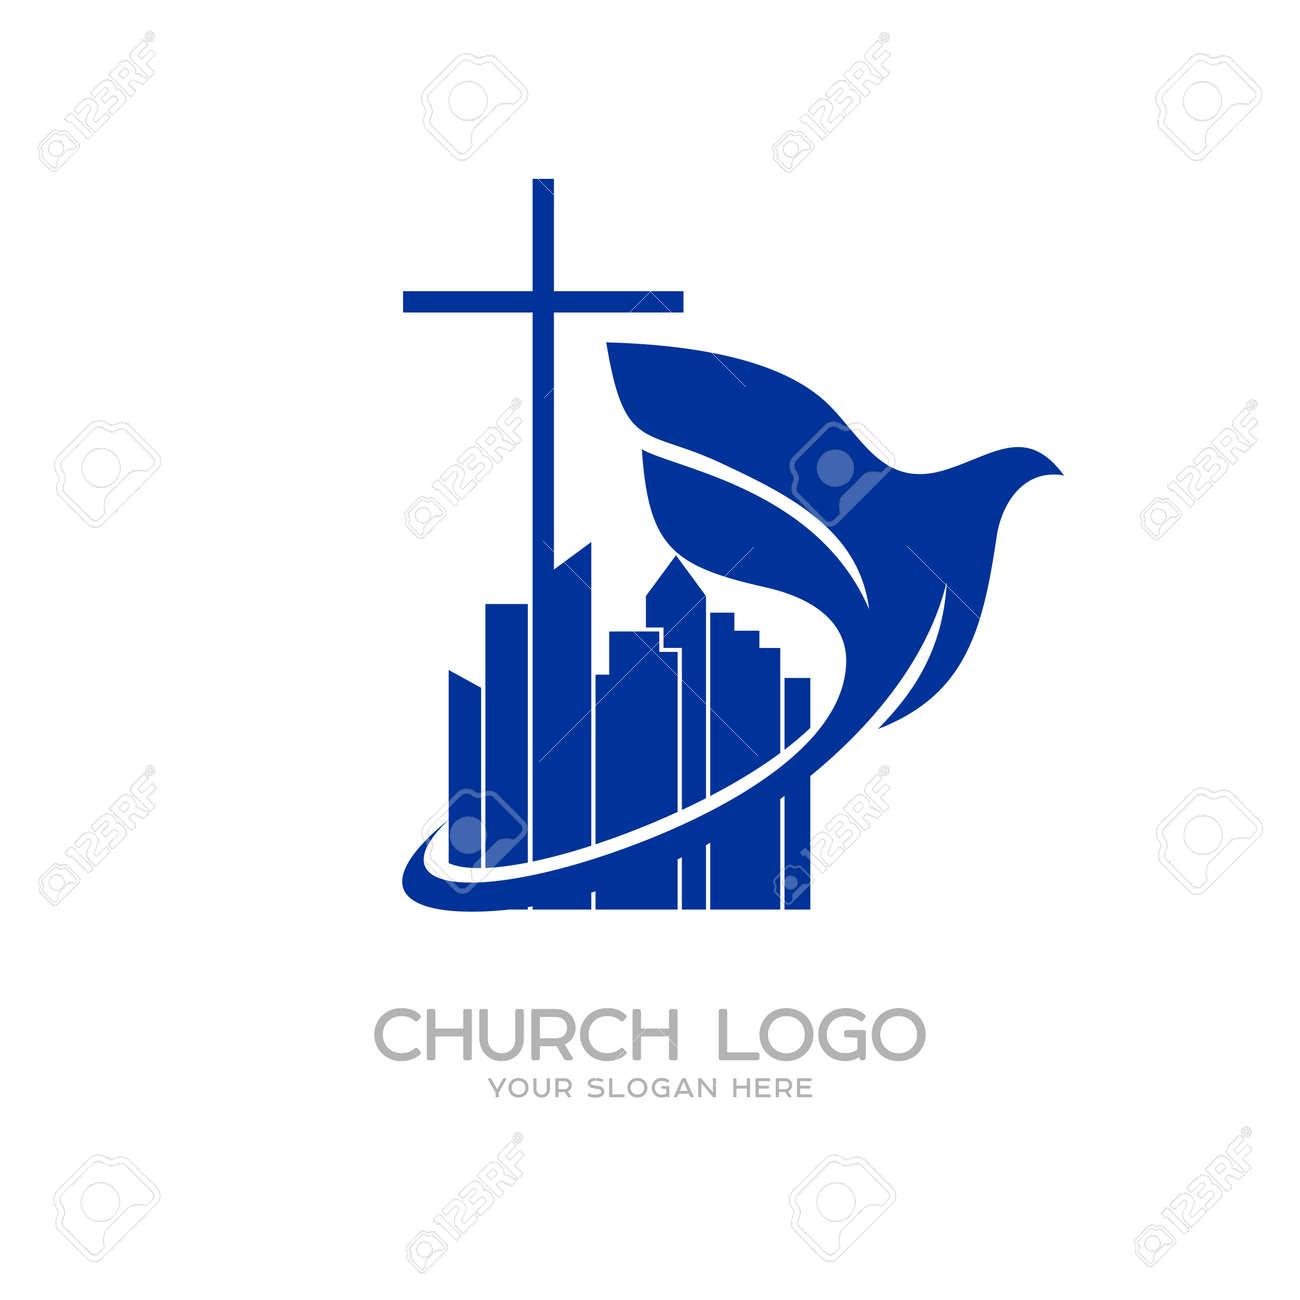 Church logo christian symbols the cross of jesus royalty free christian symbols the cross of jesus stock vector 83536116 buycottarizona